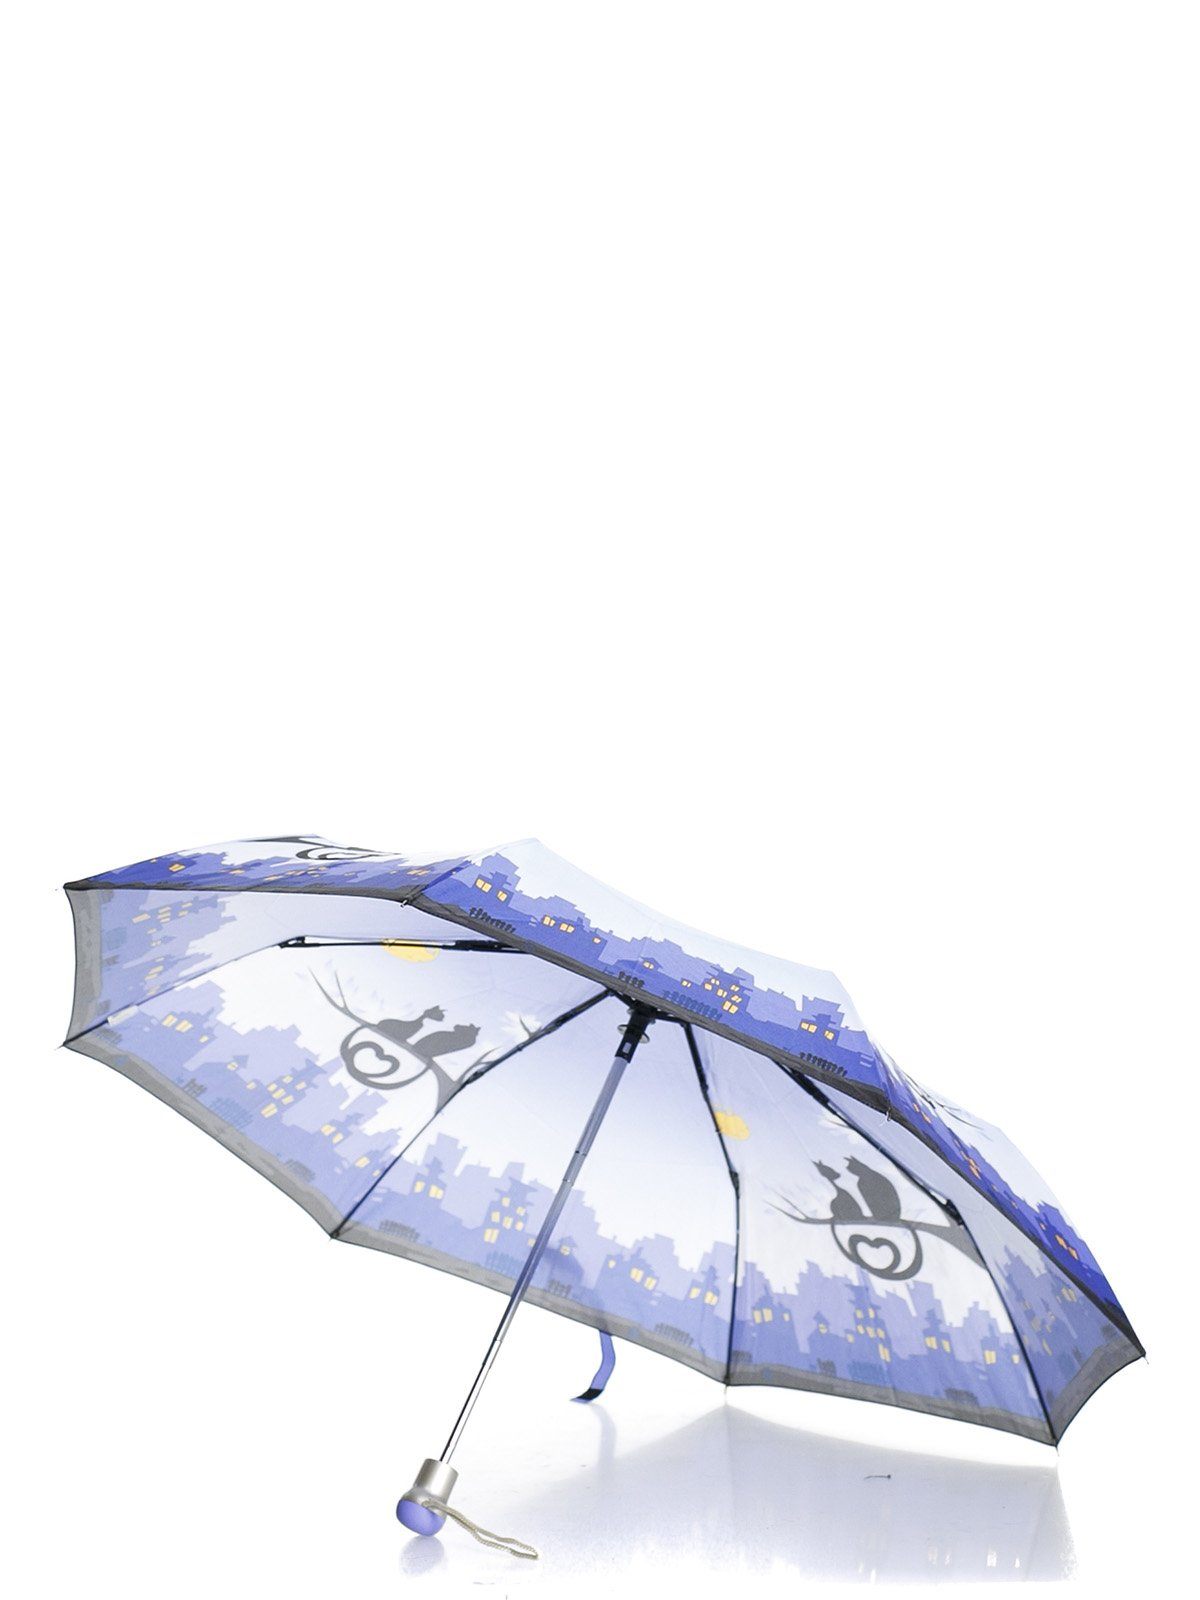 Зонт-полуавтомат | 968790 | фото 2